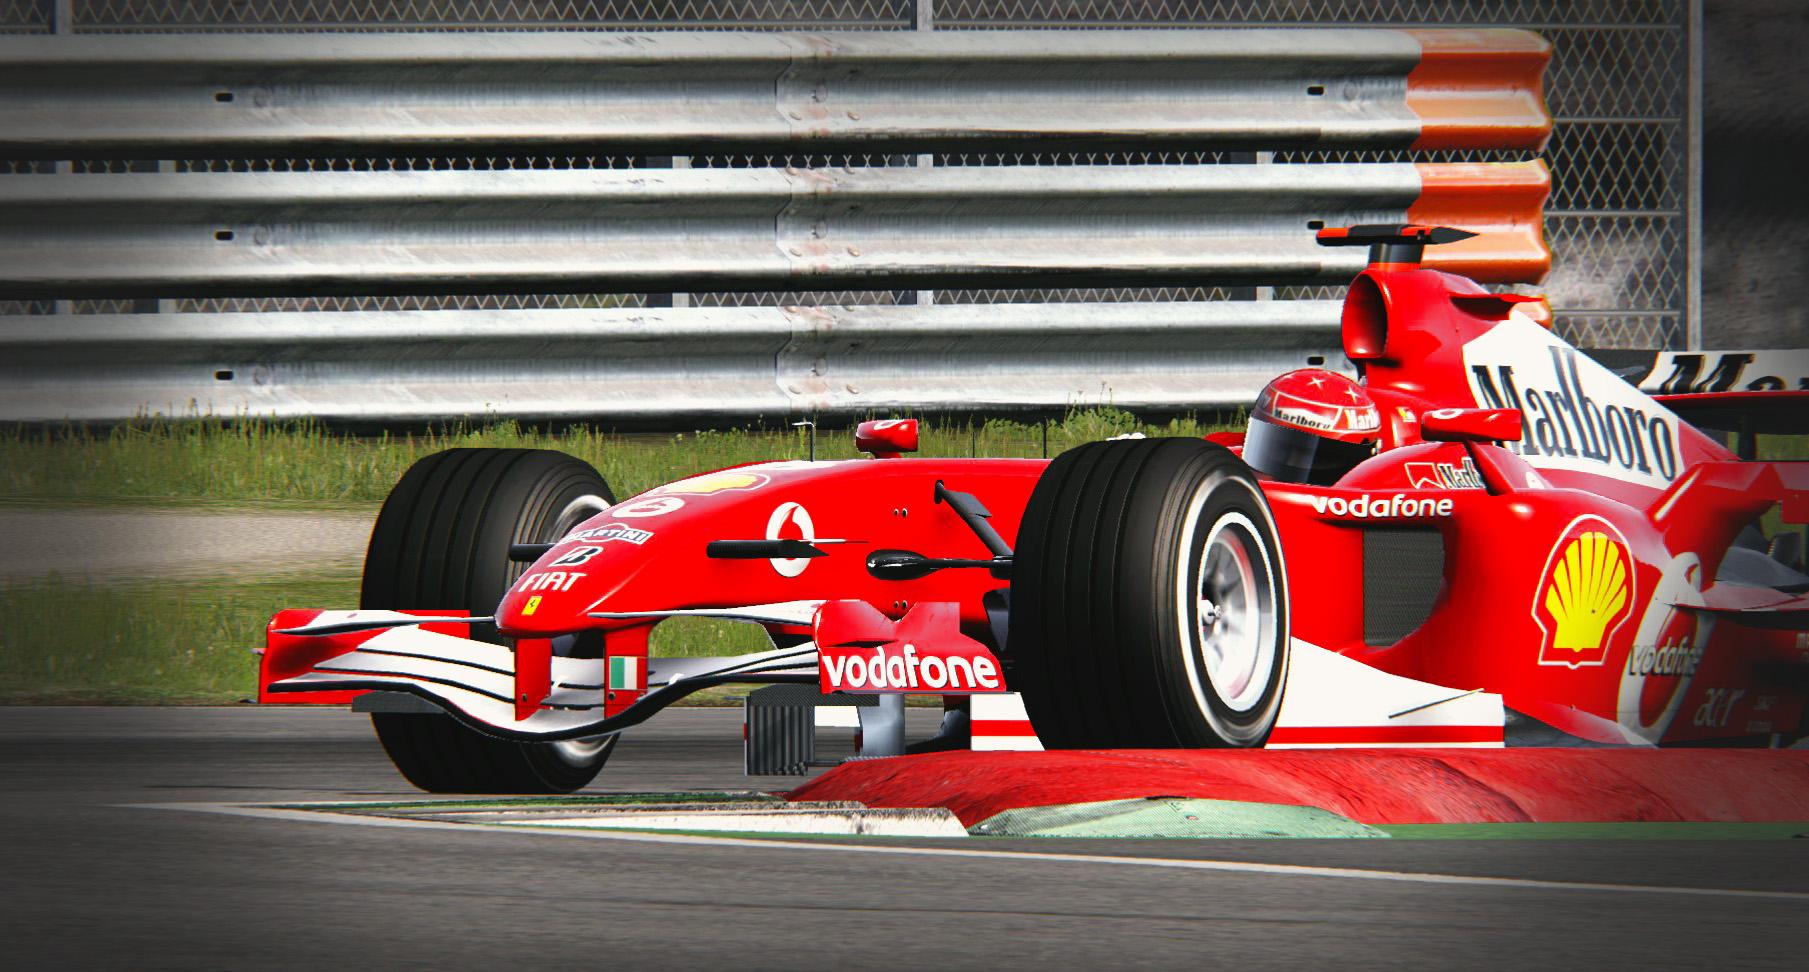 Ferrari 248 F1 at Monza